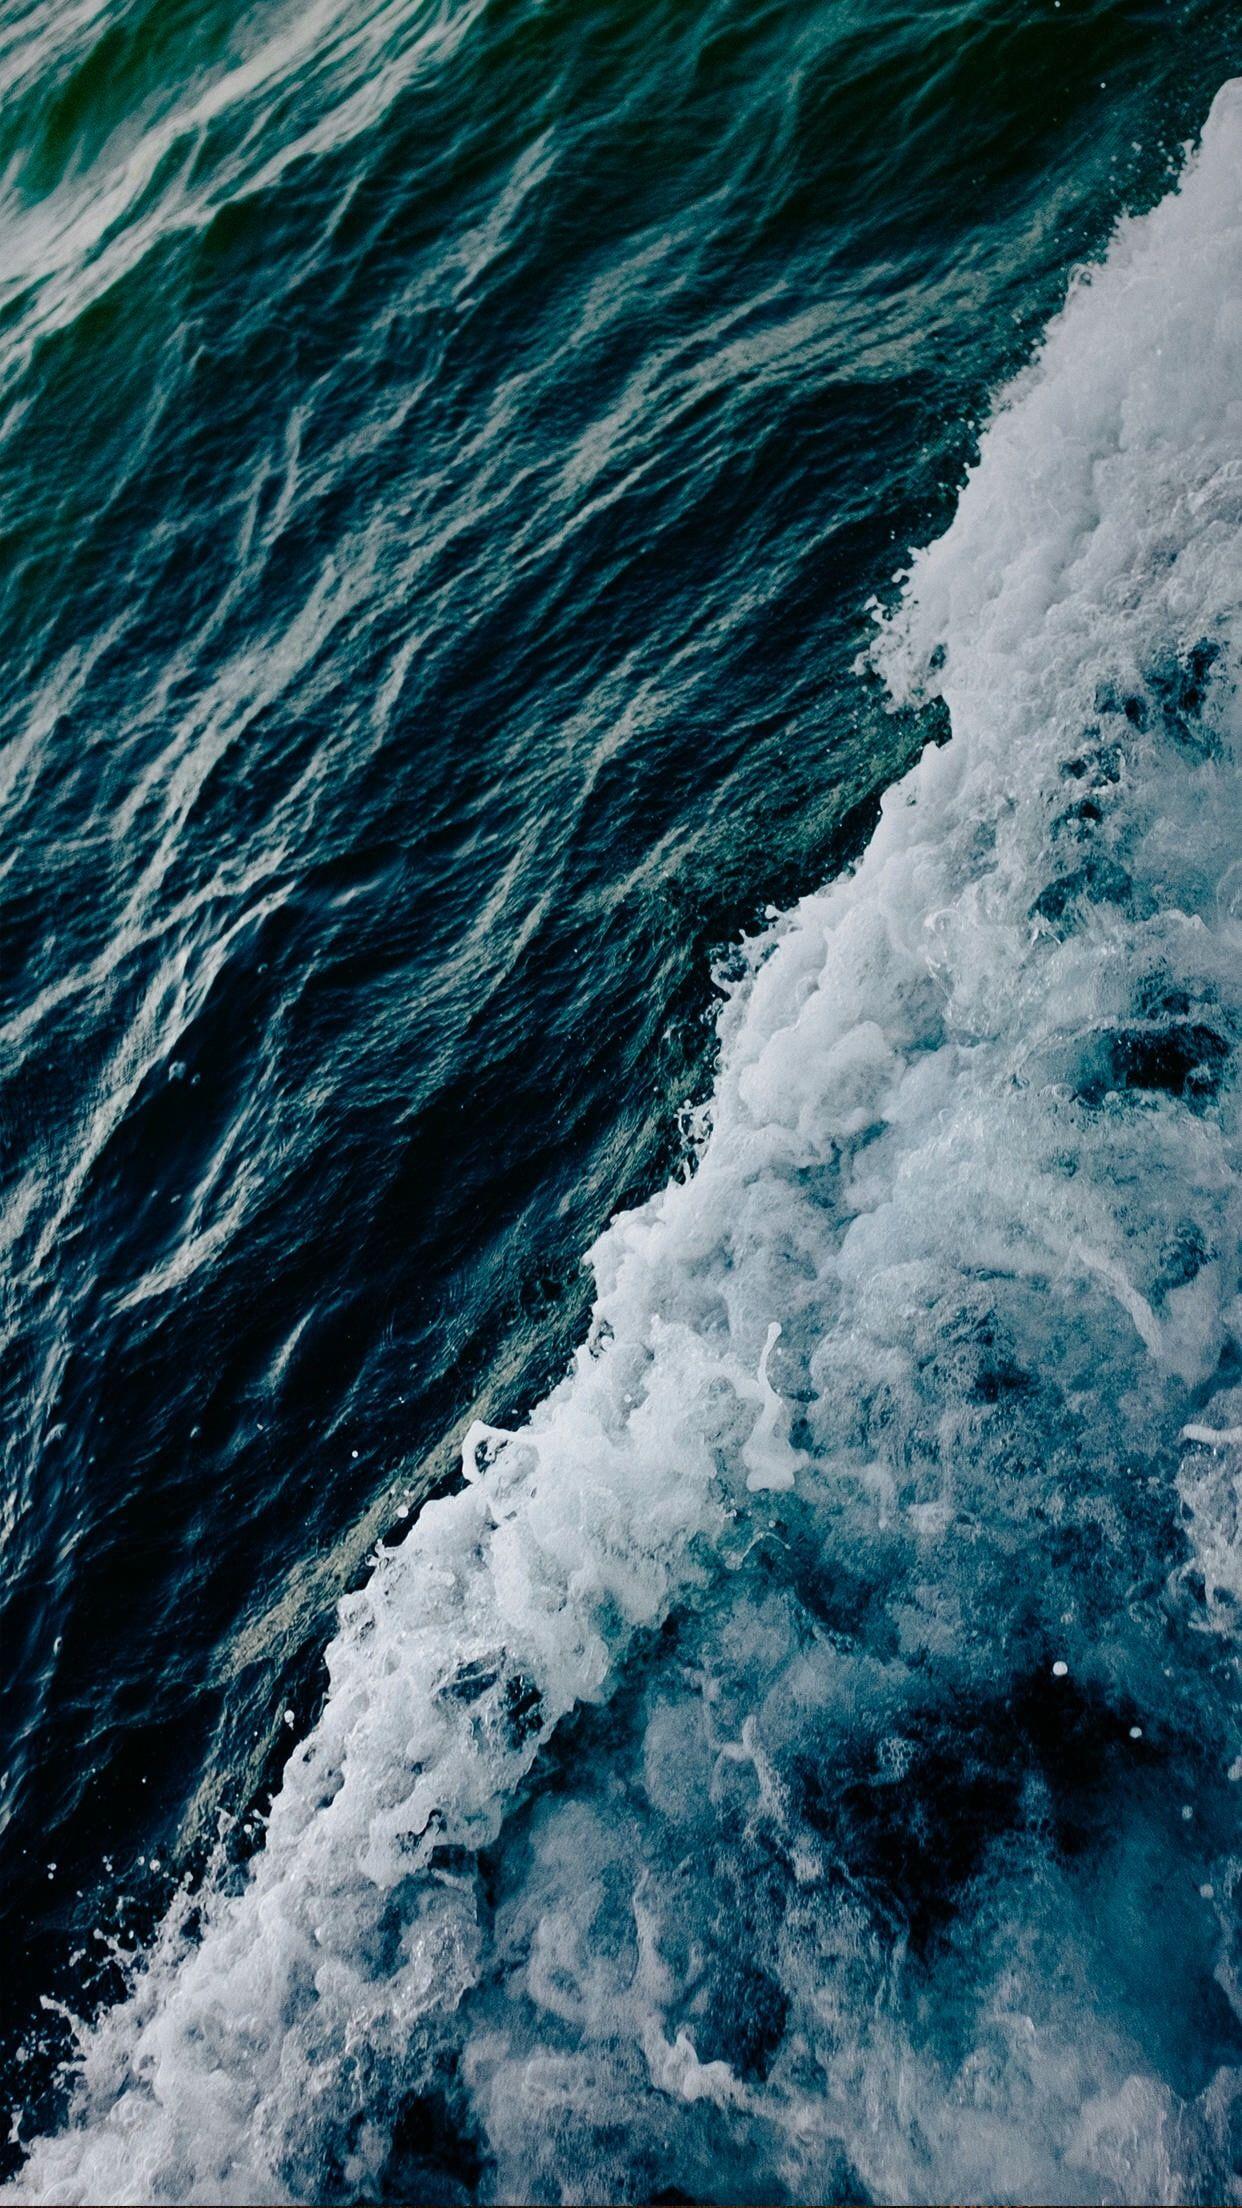 Water Sea Waves 1080p Wallpaper Hdwallpaper Desktop Ocean